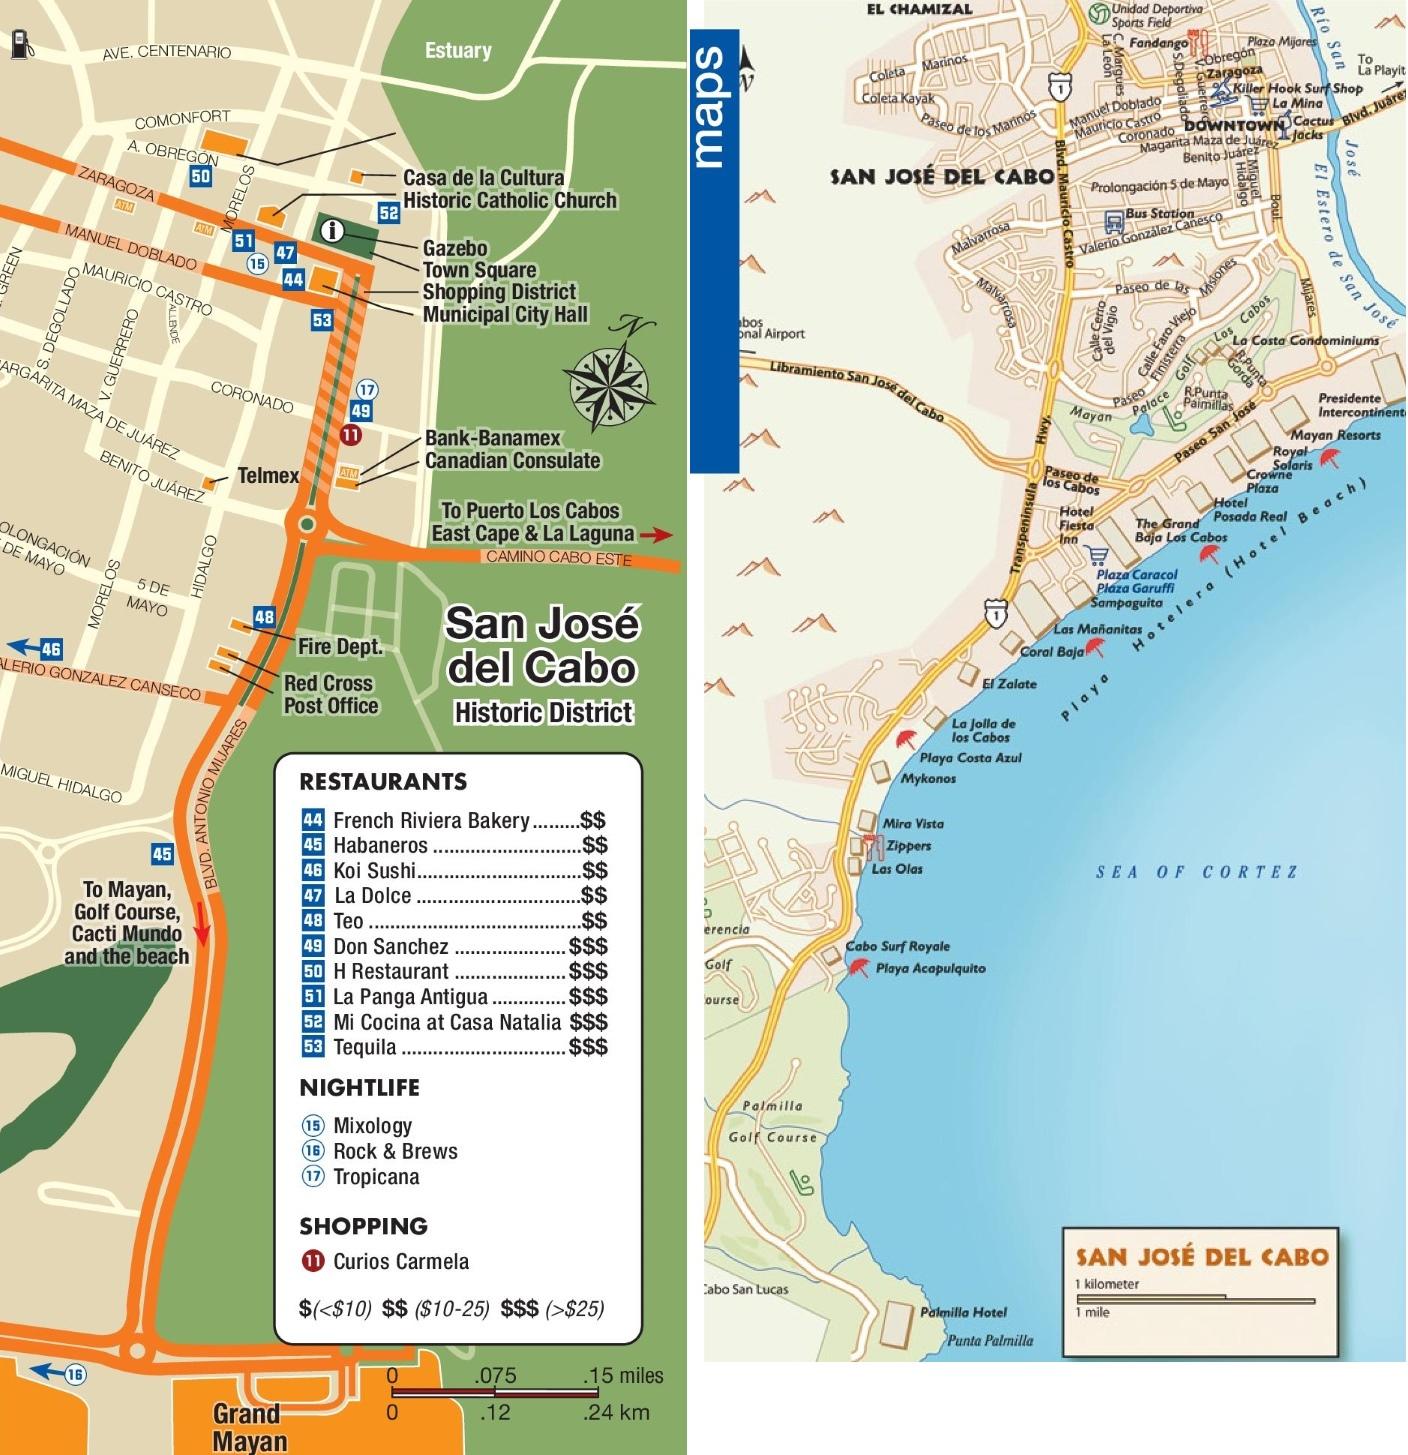 San Jos del Cabo tourist attractions map